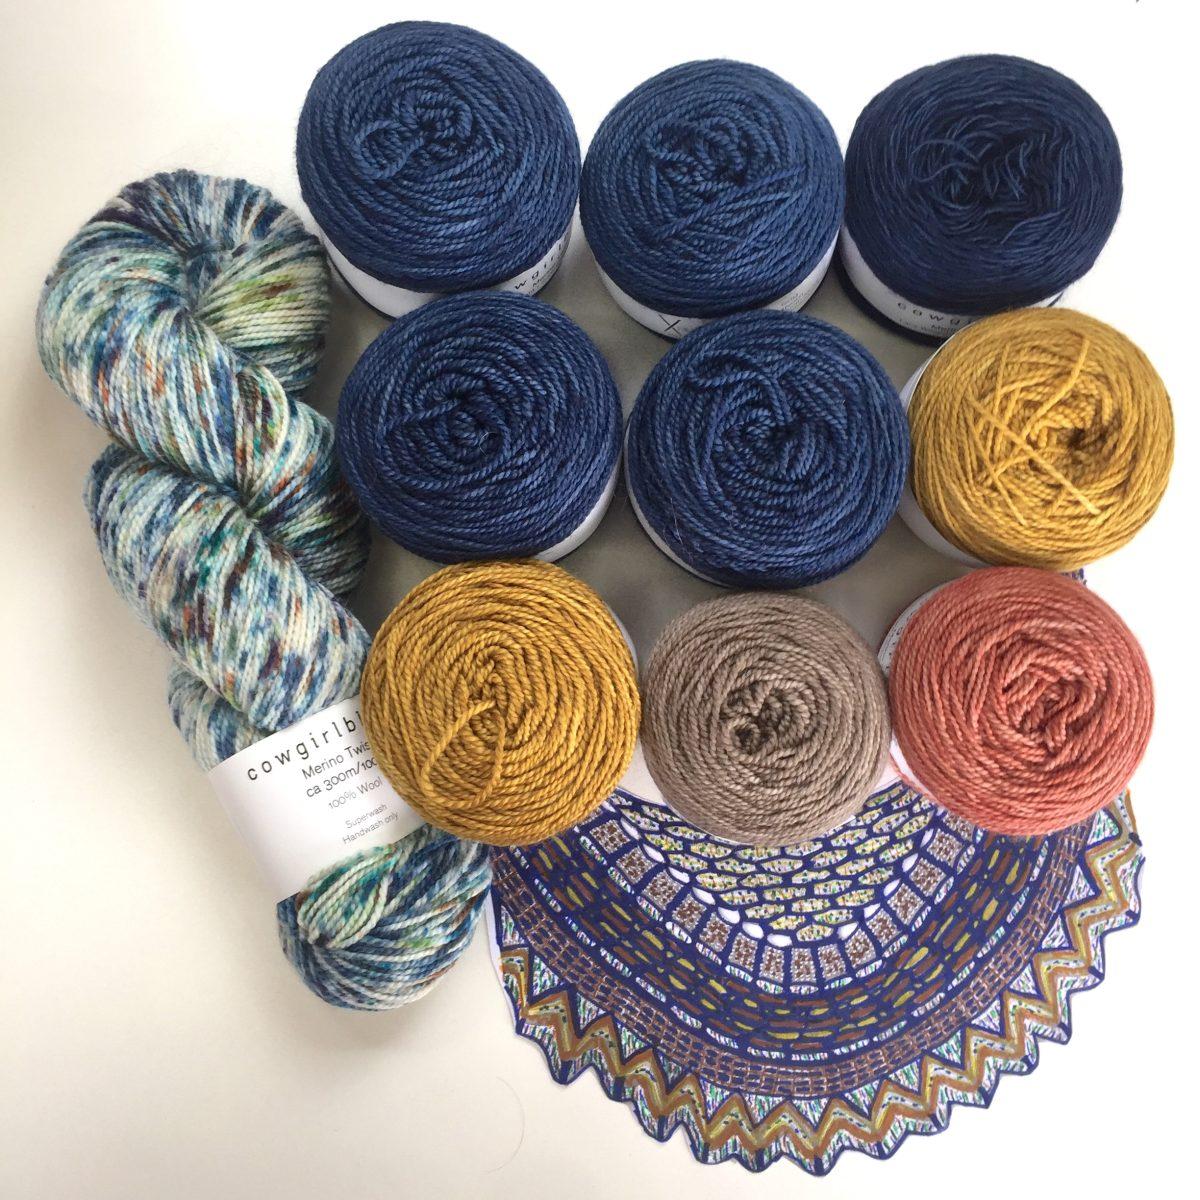 Slipstravaganza Shawl knit kit in Indigo